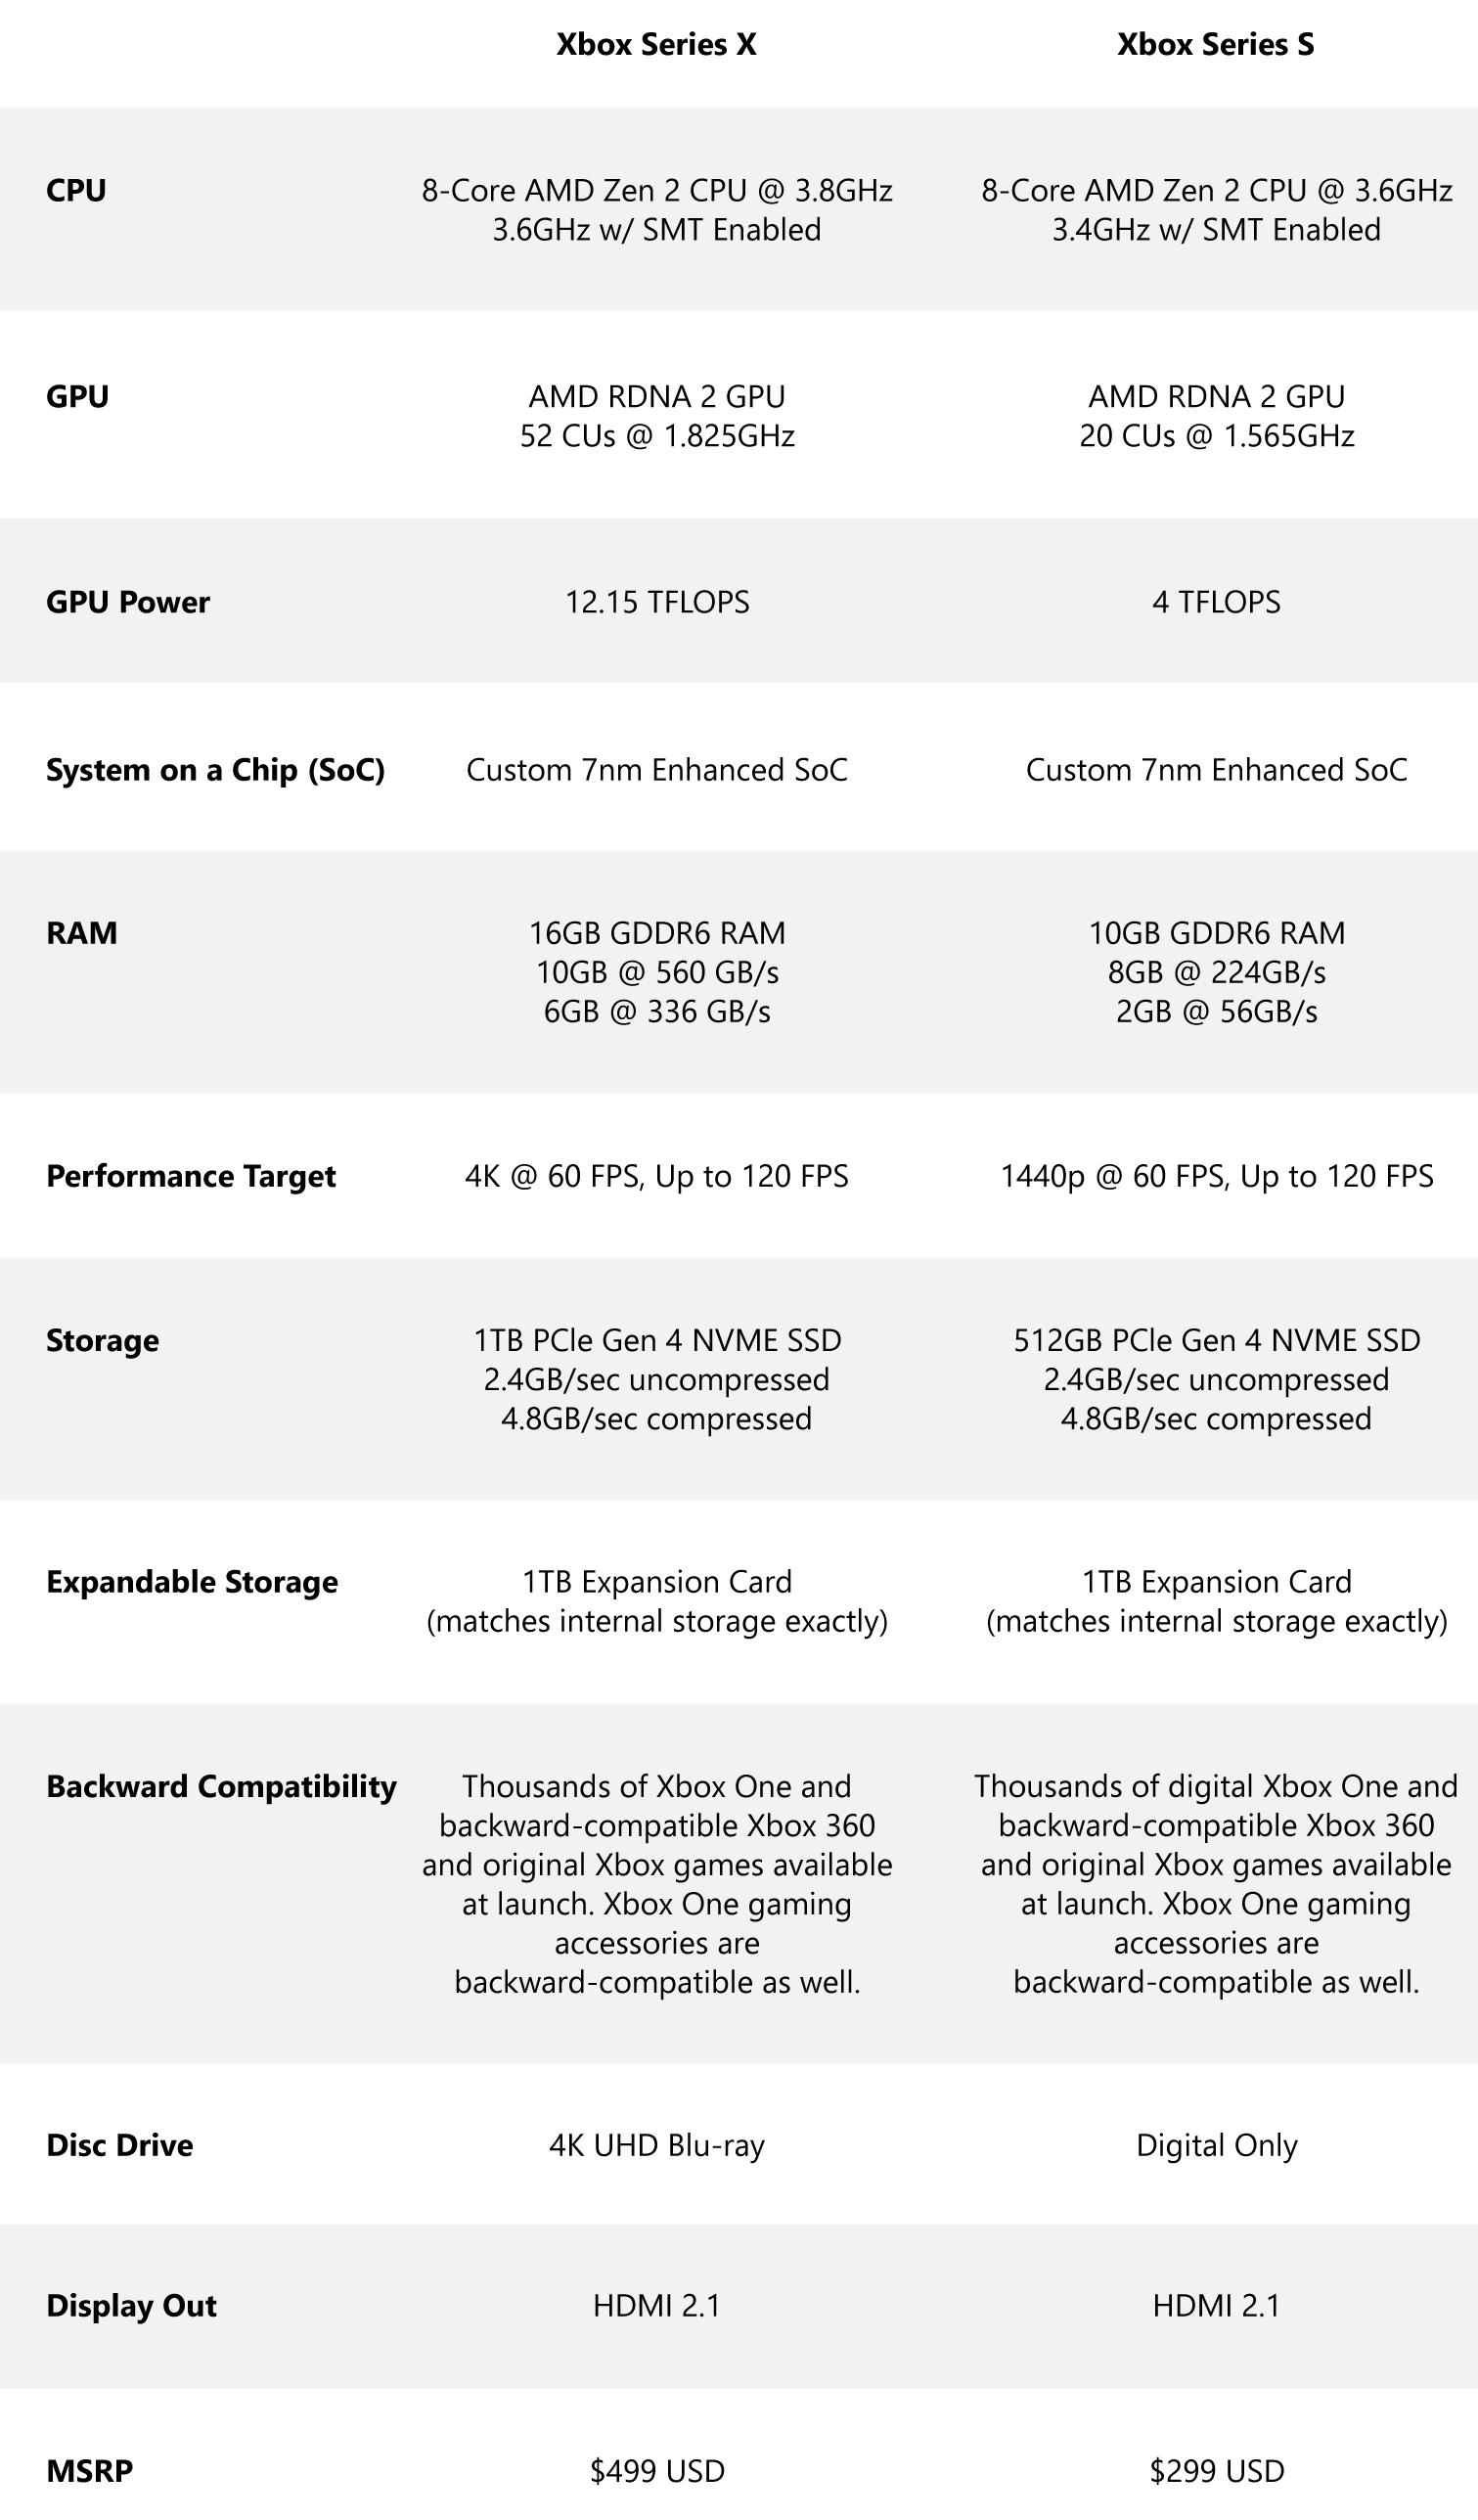 Xbox Series X / Xbox Series S full tech specs